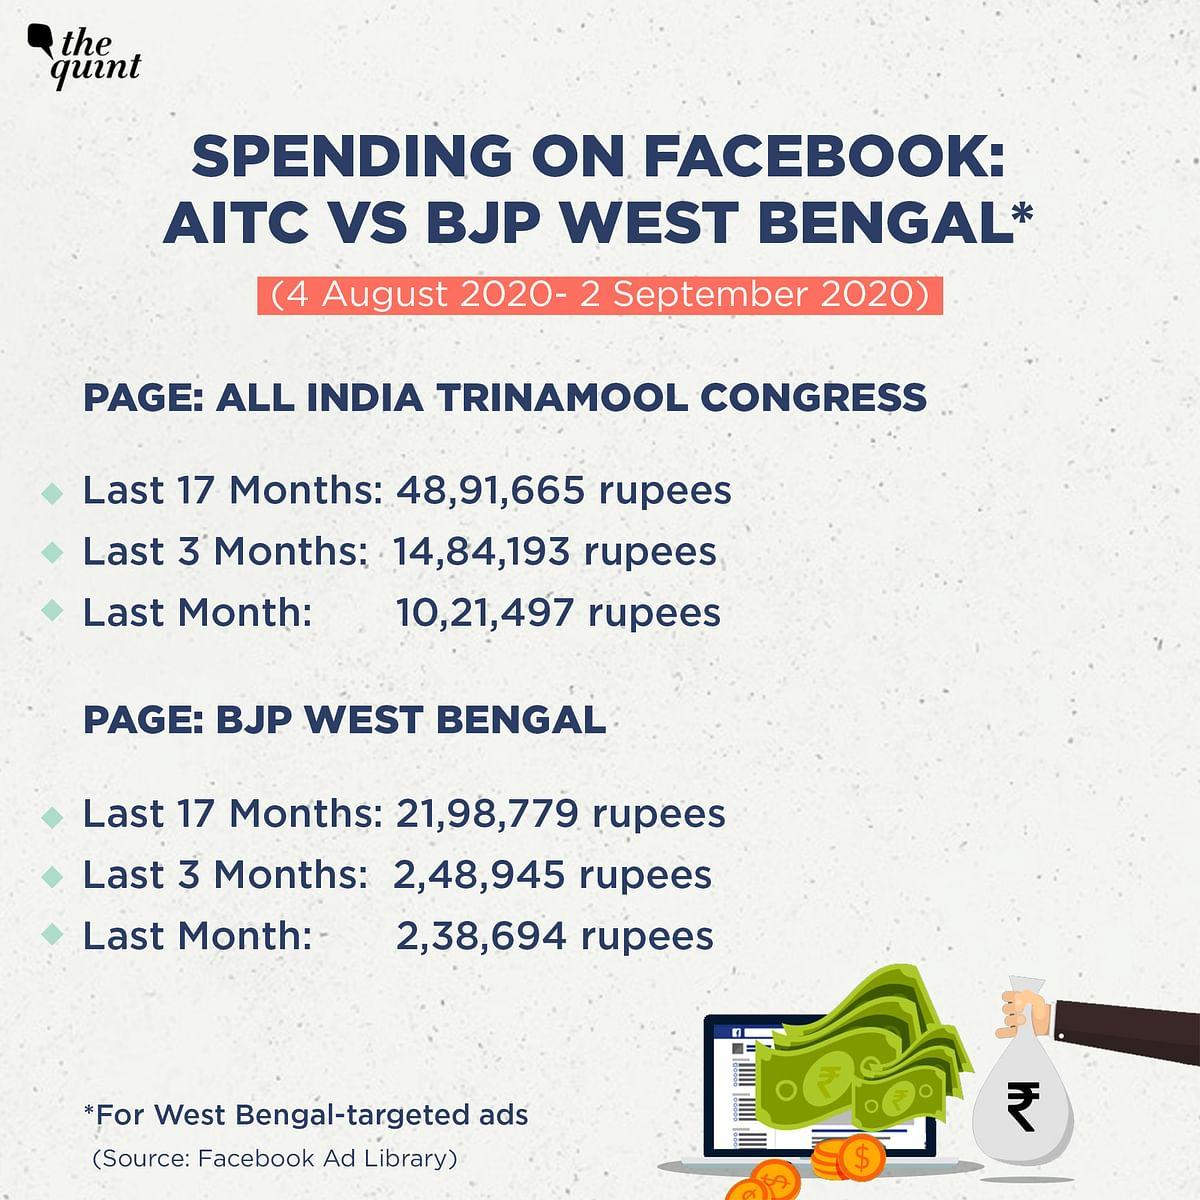 Spending on Facebook: AITC vs BJP West Bengal